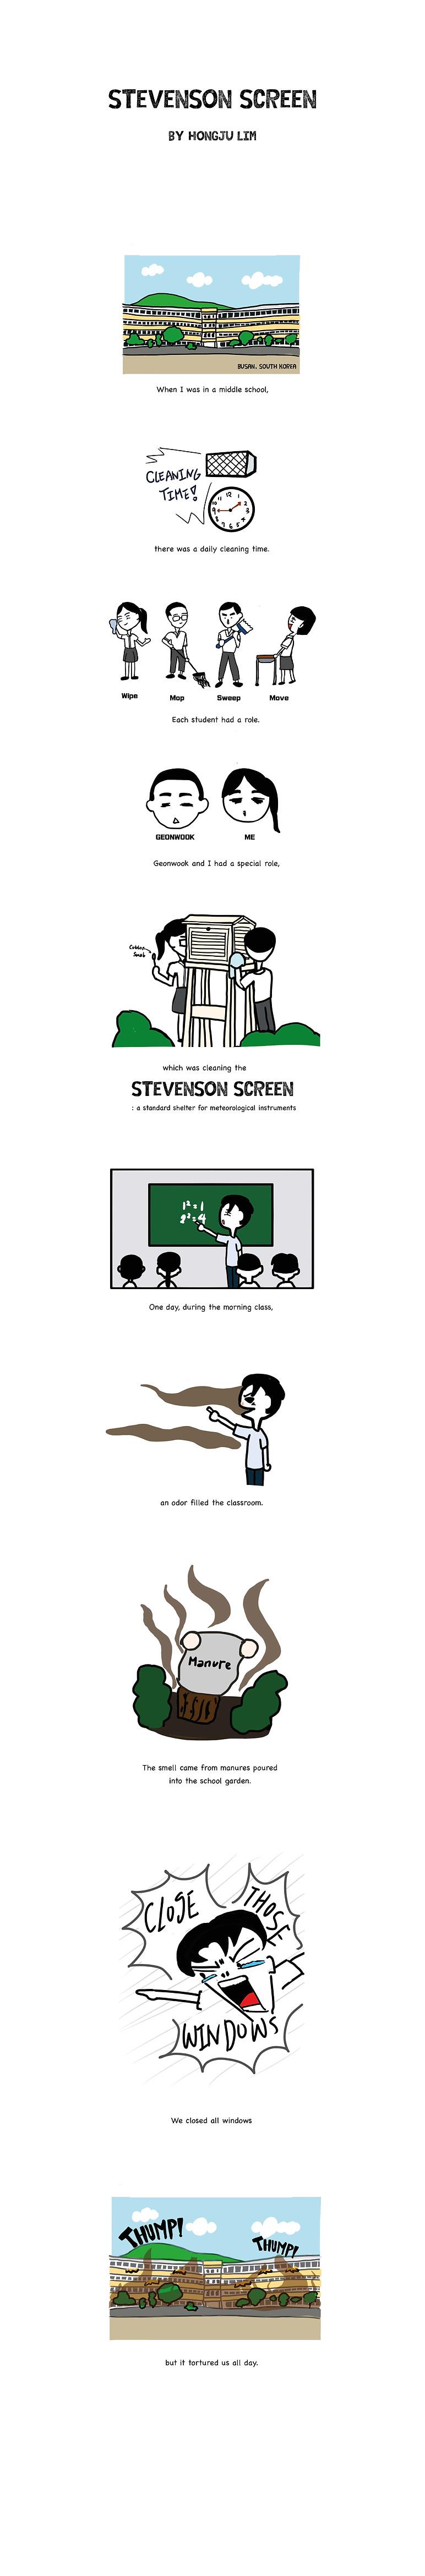 Comic_Hongju_Lim_Page_1.jpg